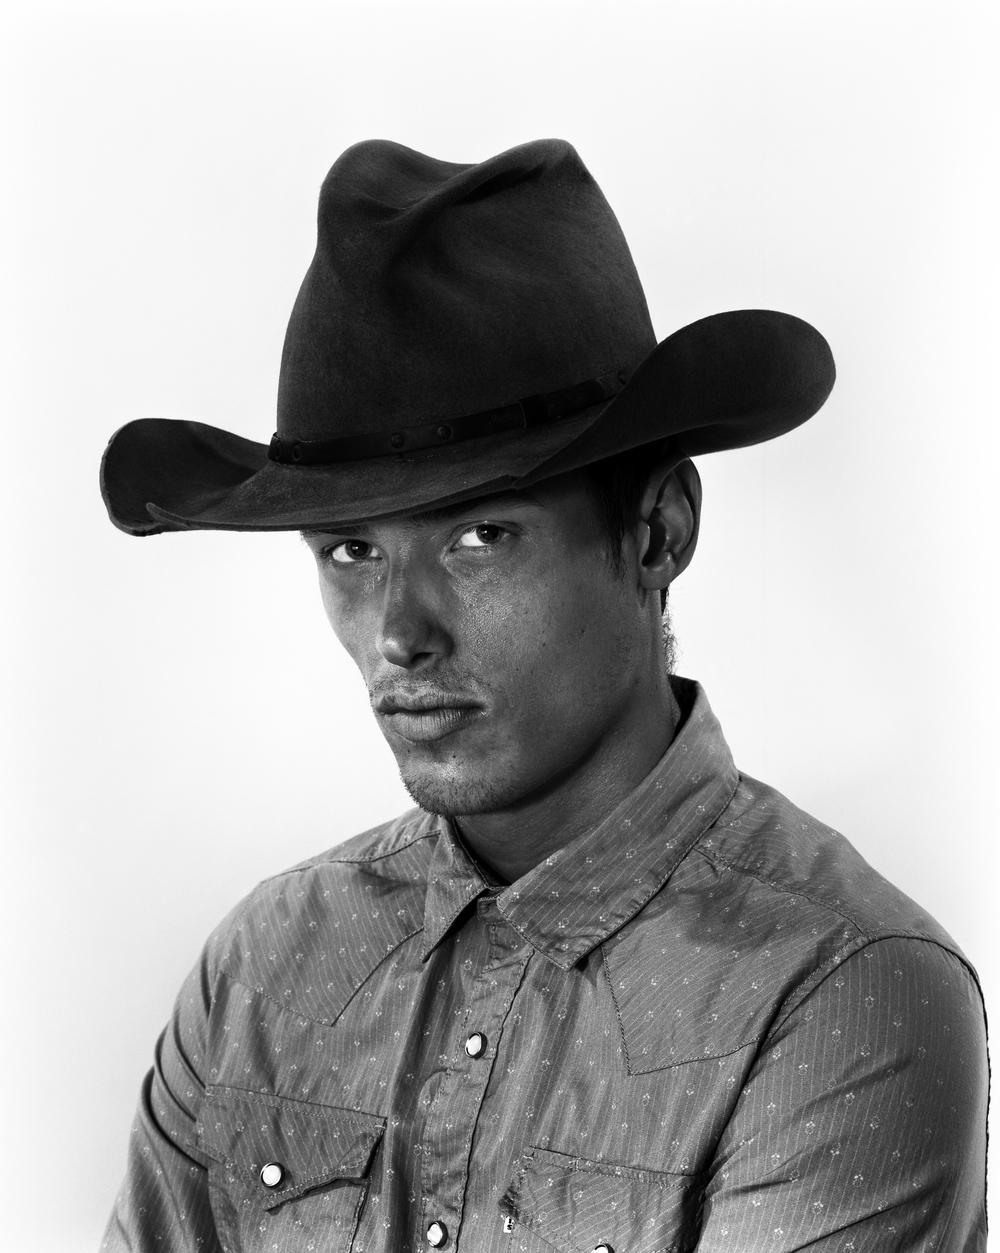 TP_Cowboy-7.jpg